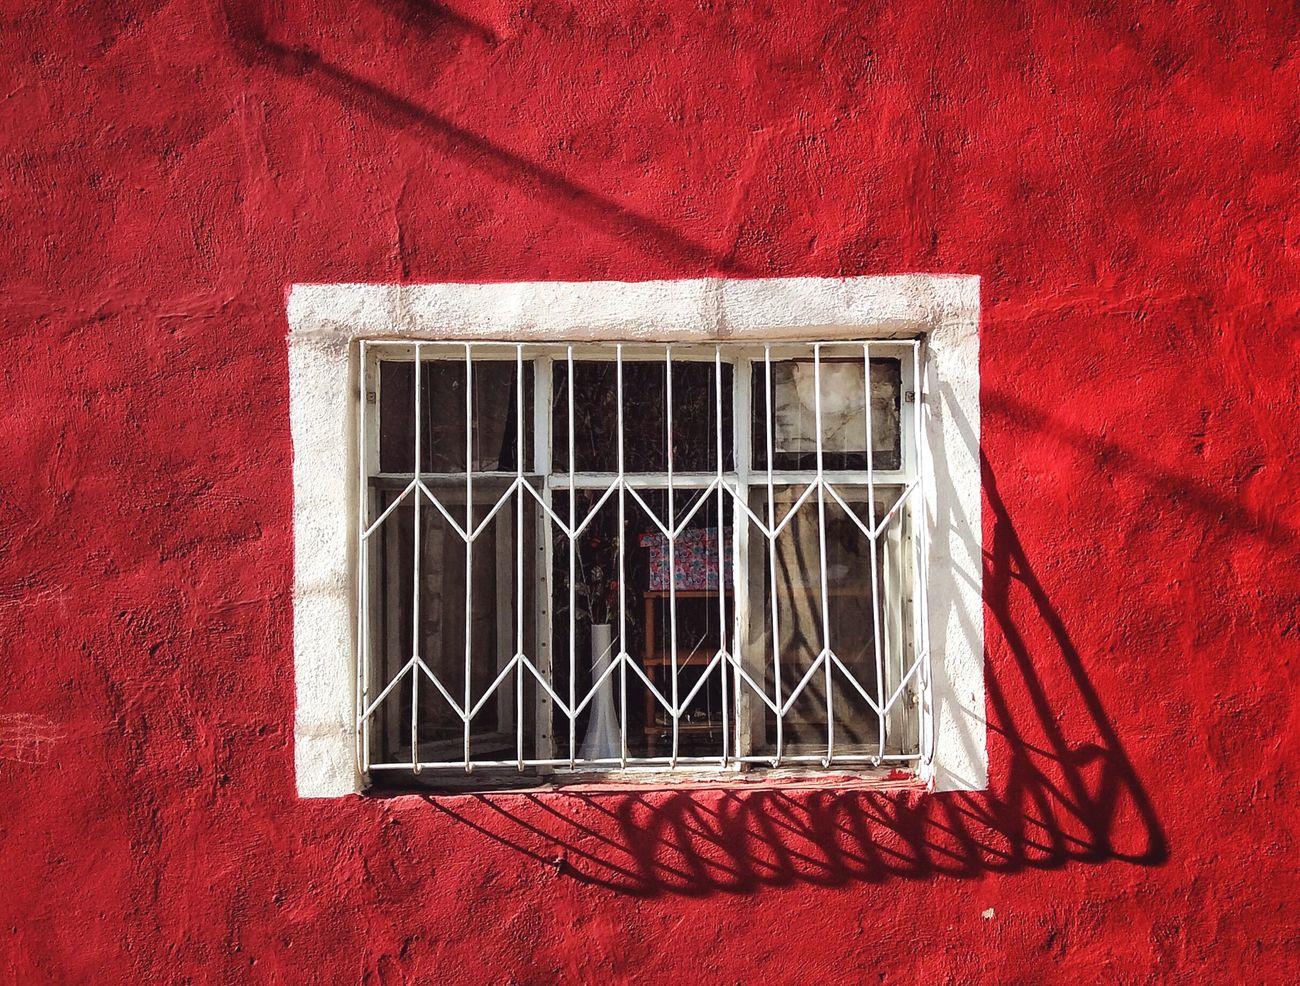 Window Severekçekiyoruz Photoshoot Photooftheday Photographer Day Window Red Photo Photo Of The Day Photograph